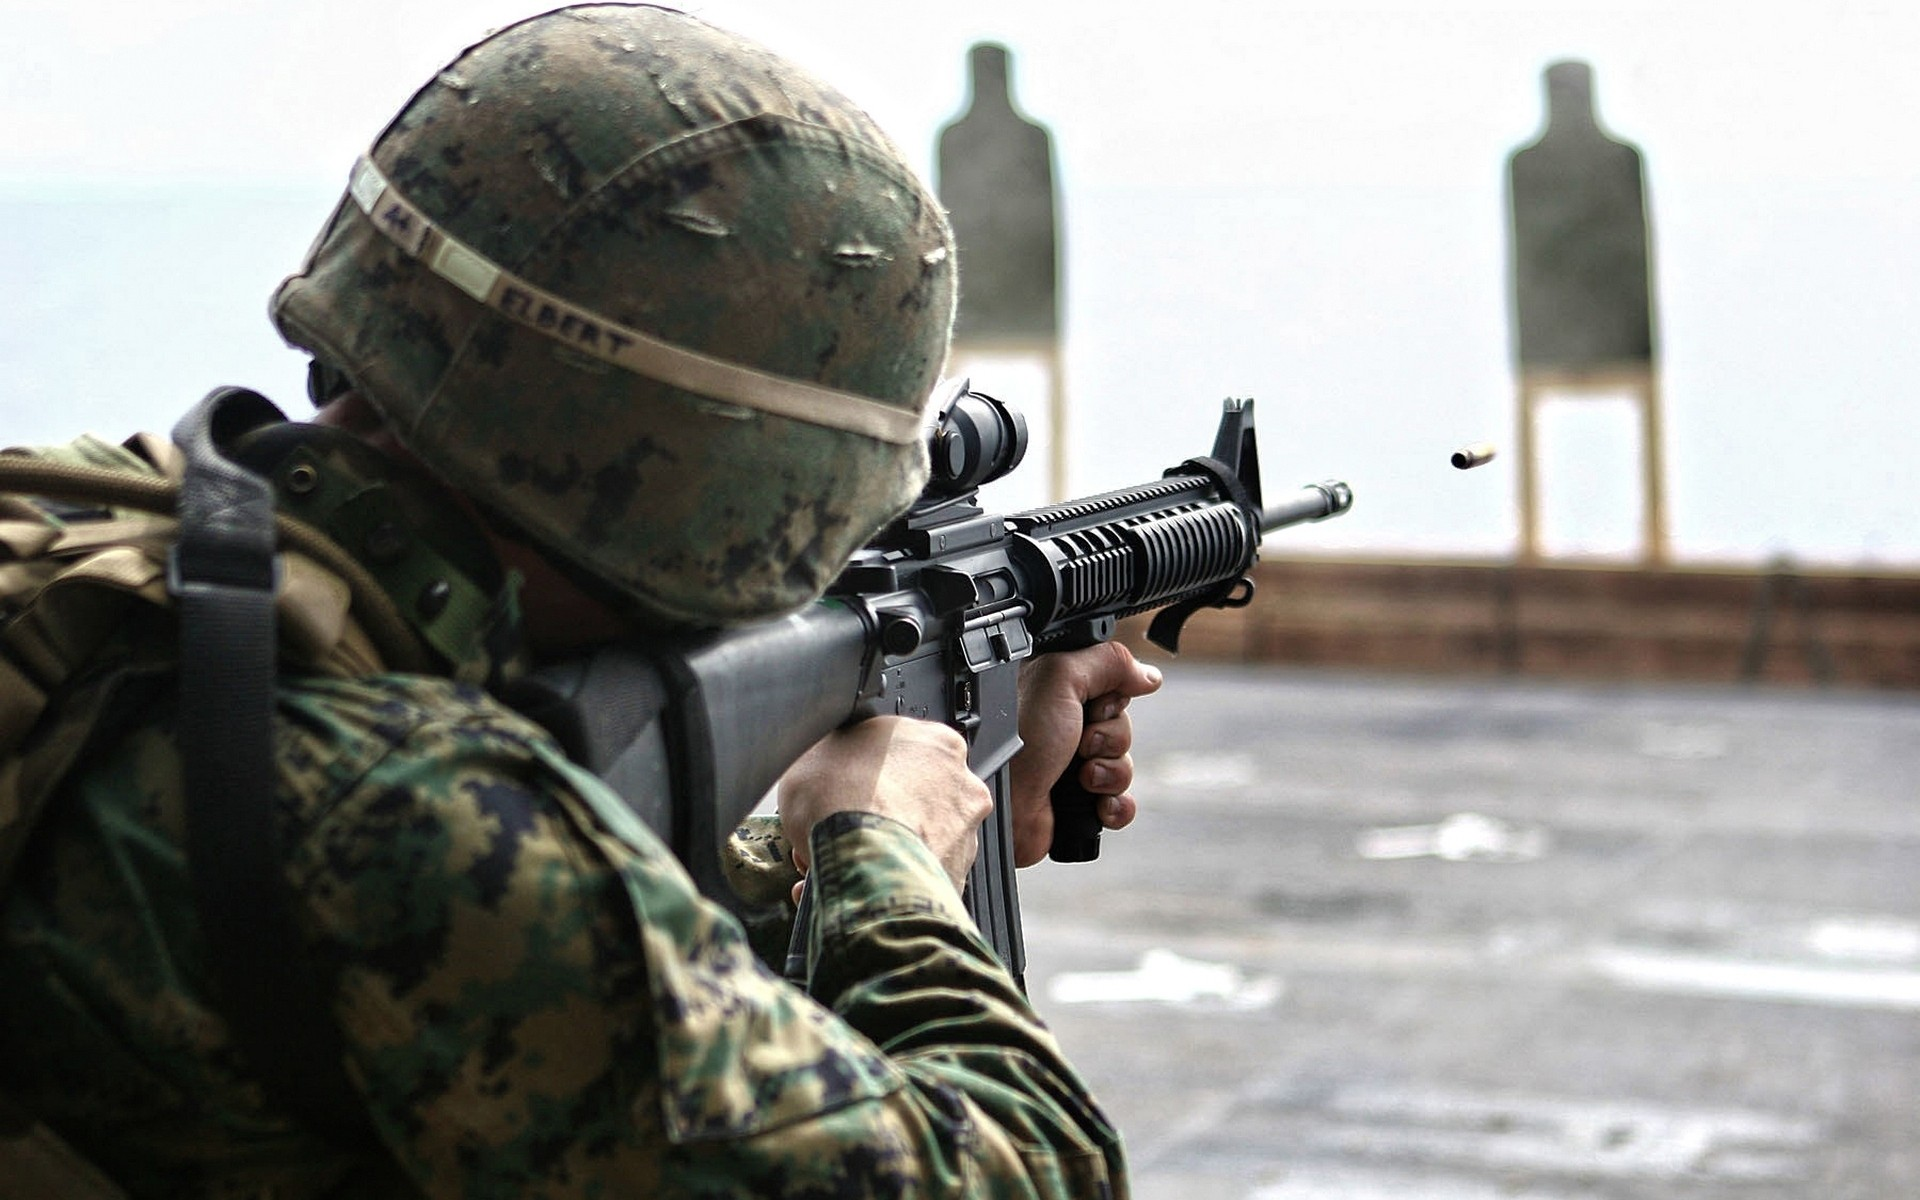 US Marine Corps Soldier